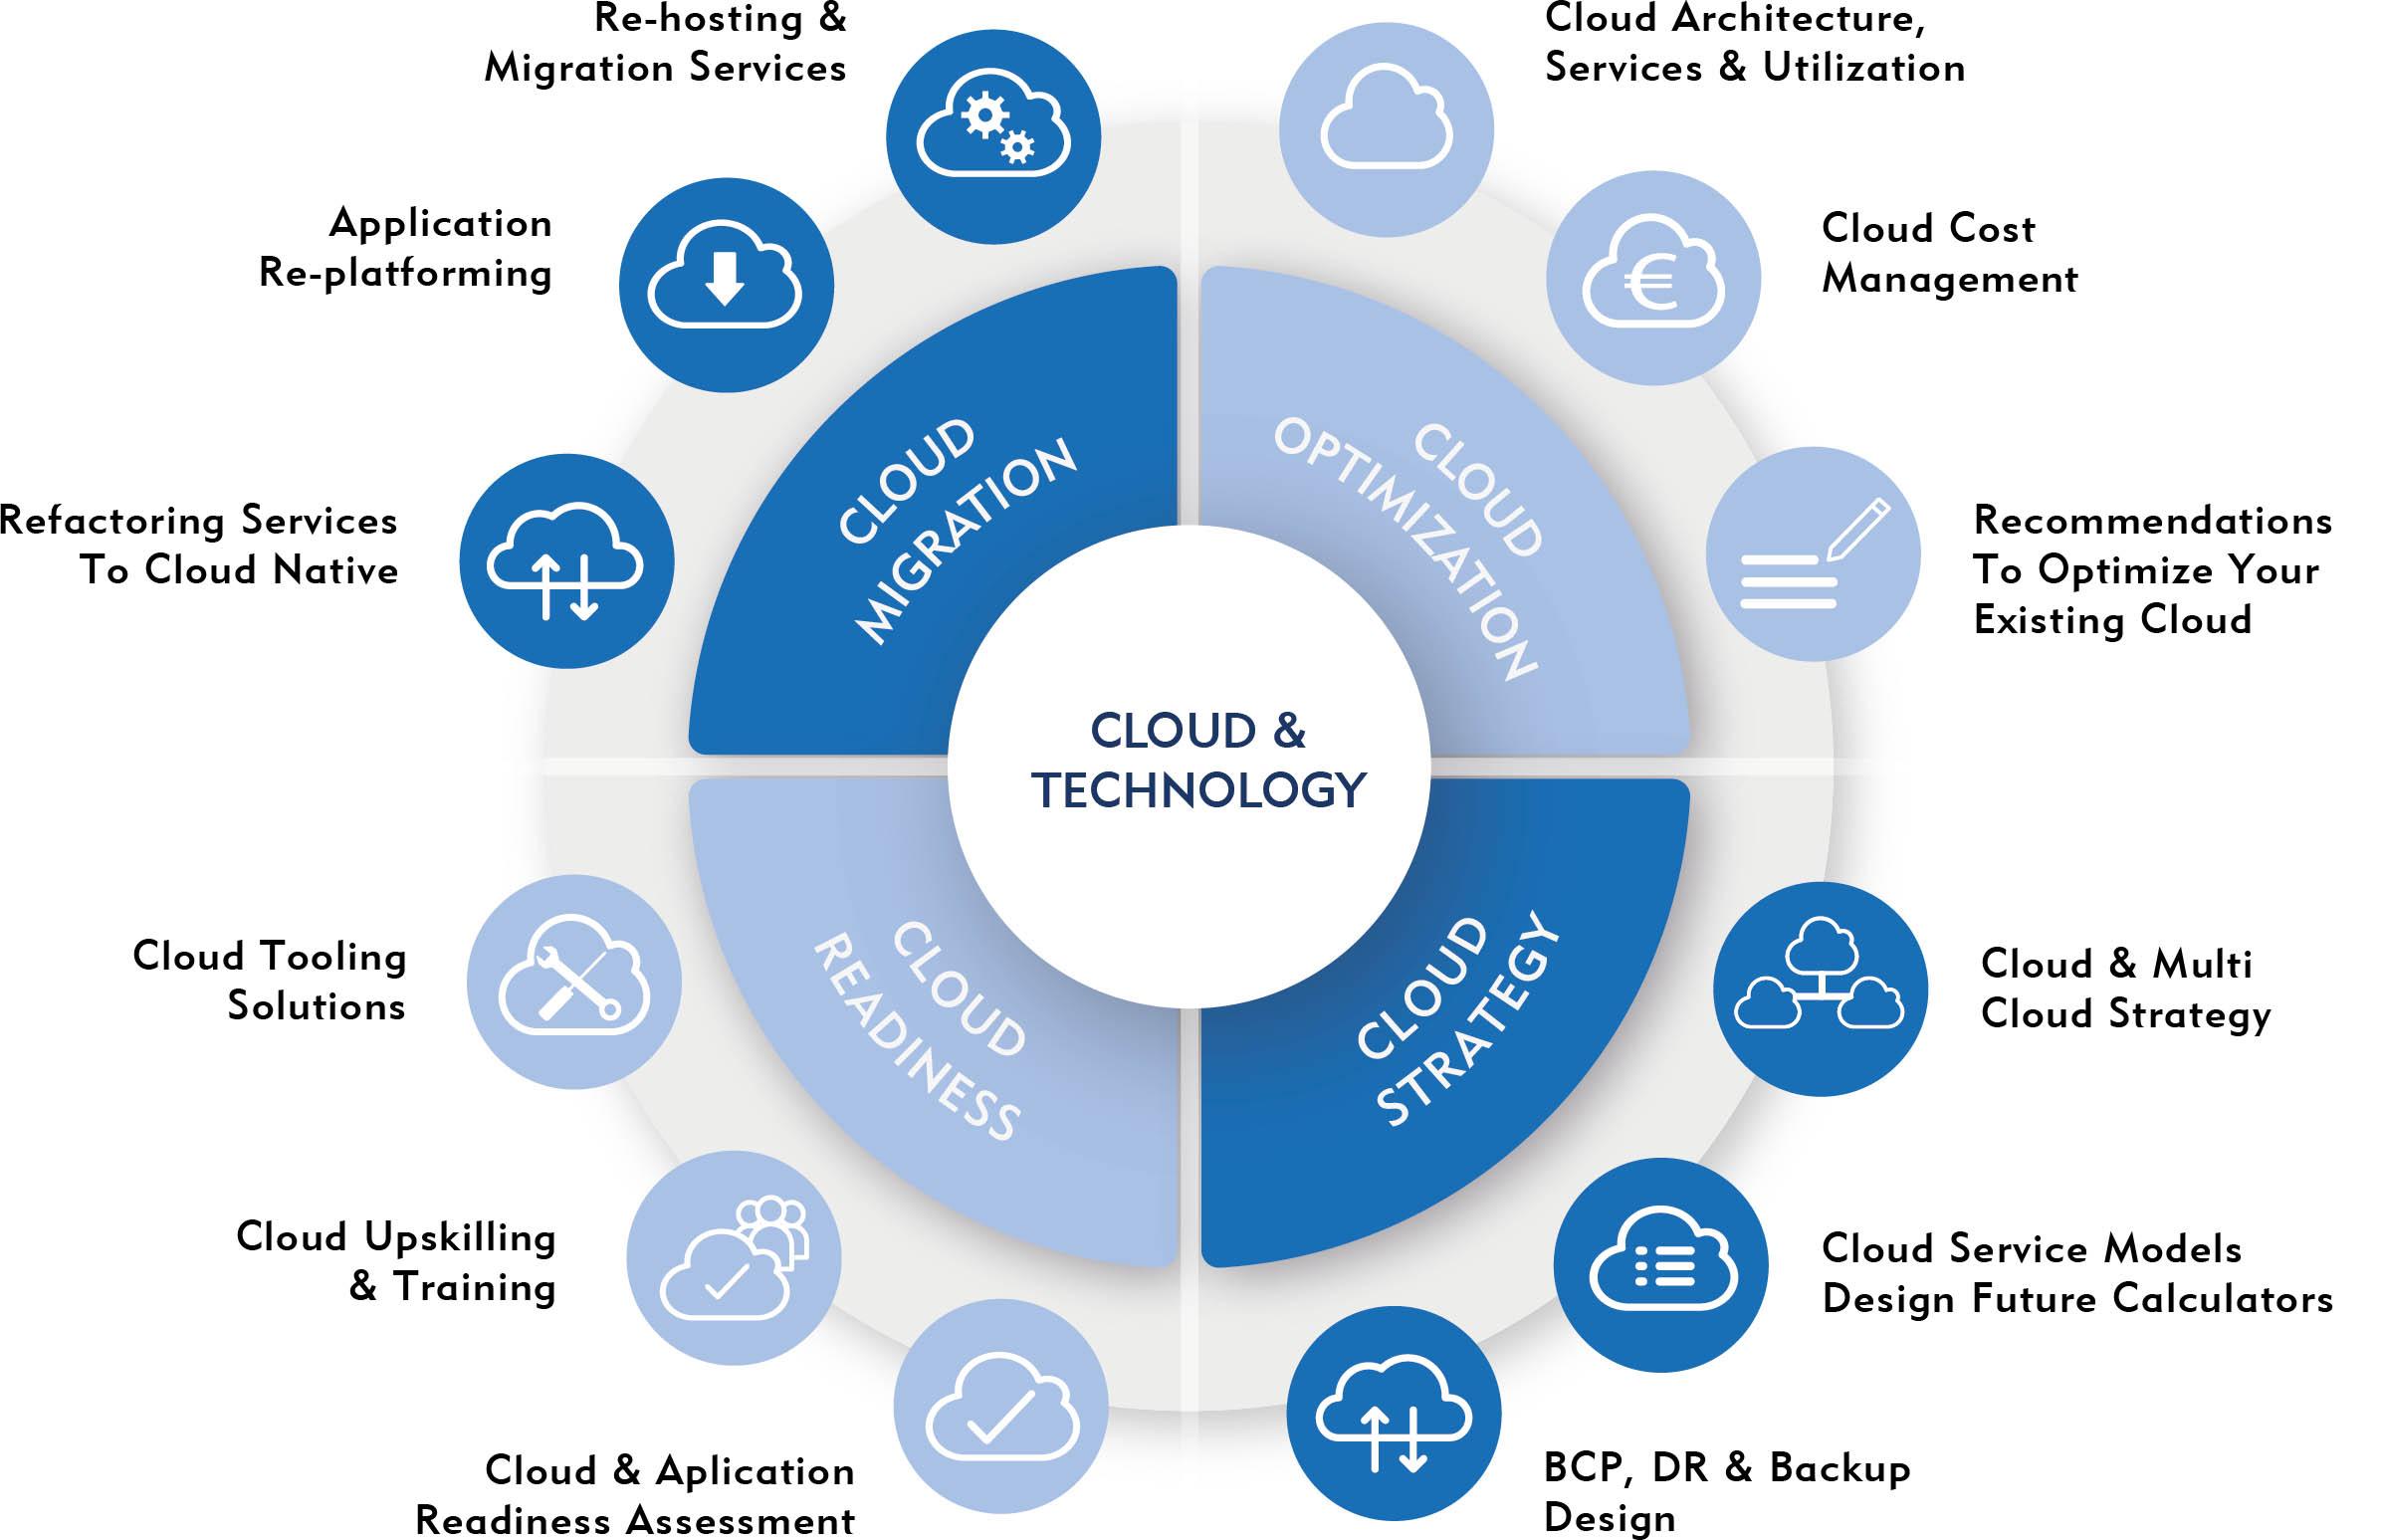 Cloud Transformation Services Wheel